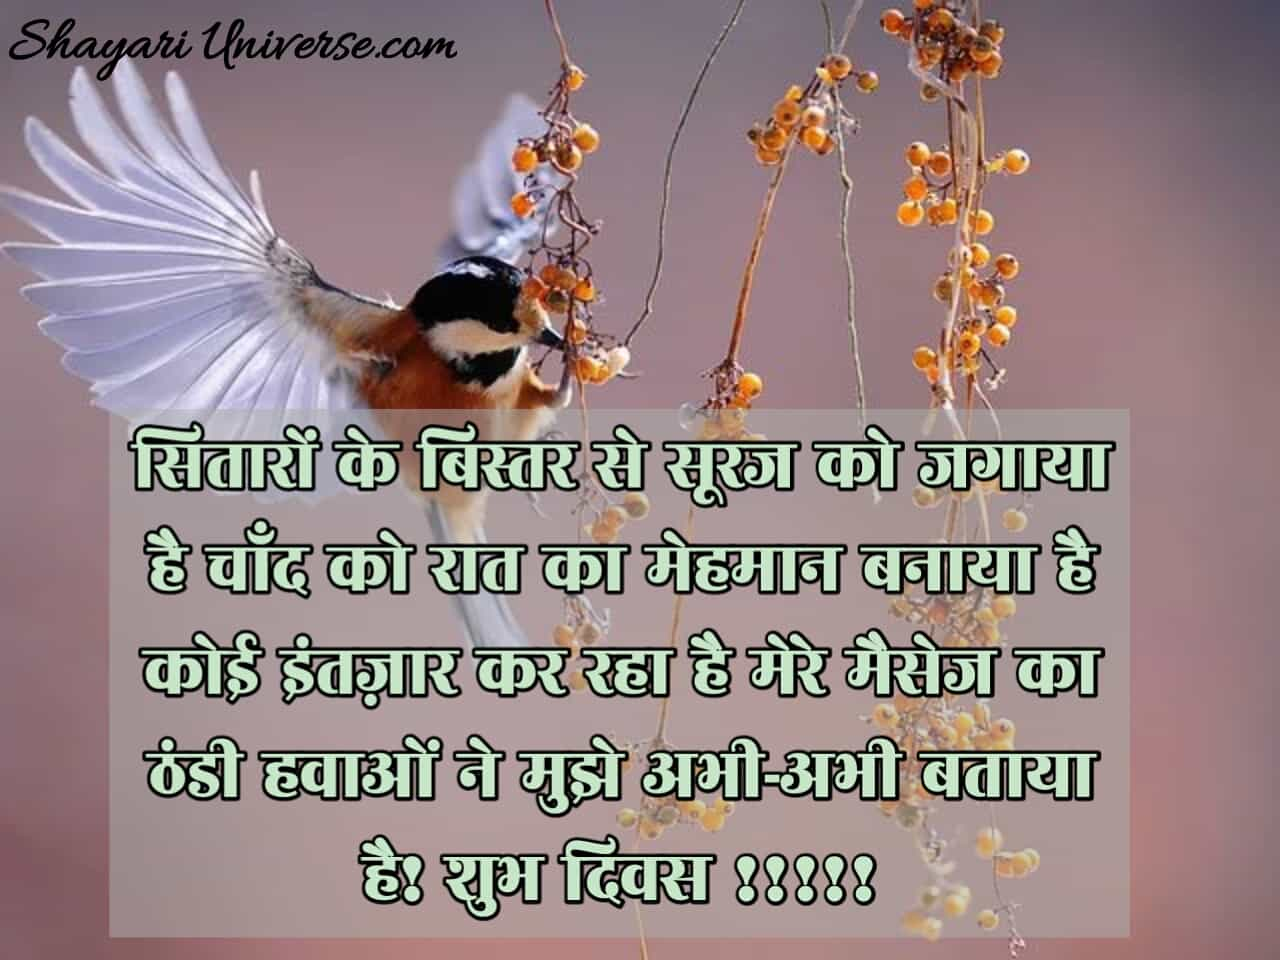 good morning thoughts in hindi, good morning message in hindi